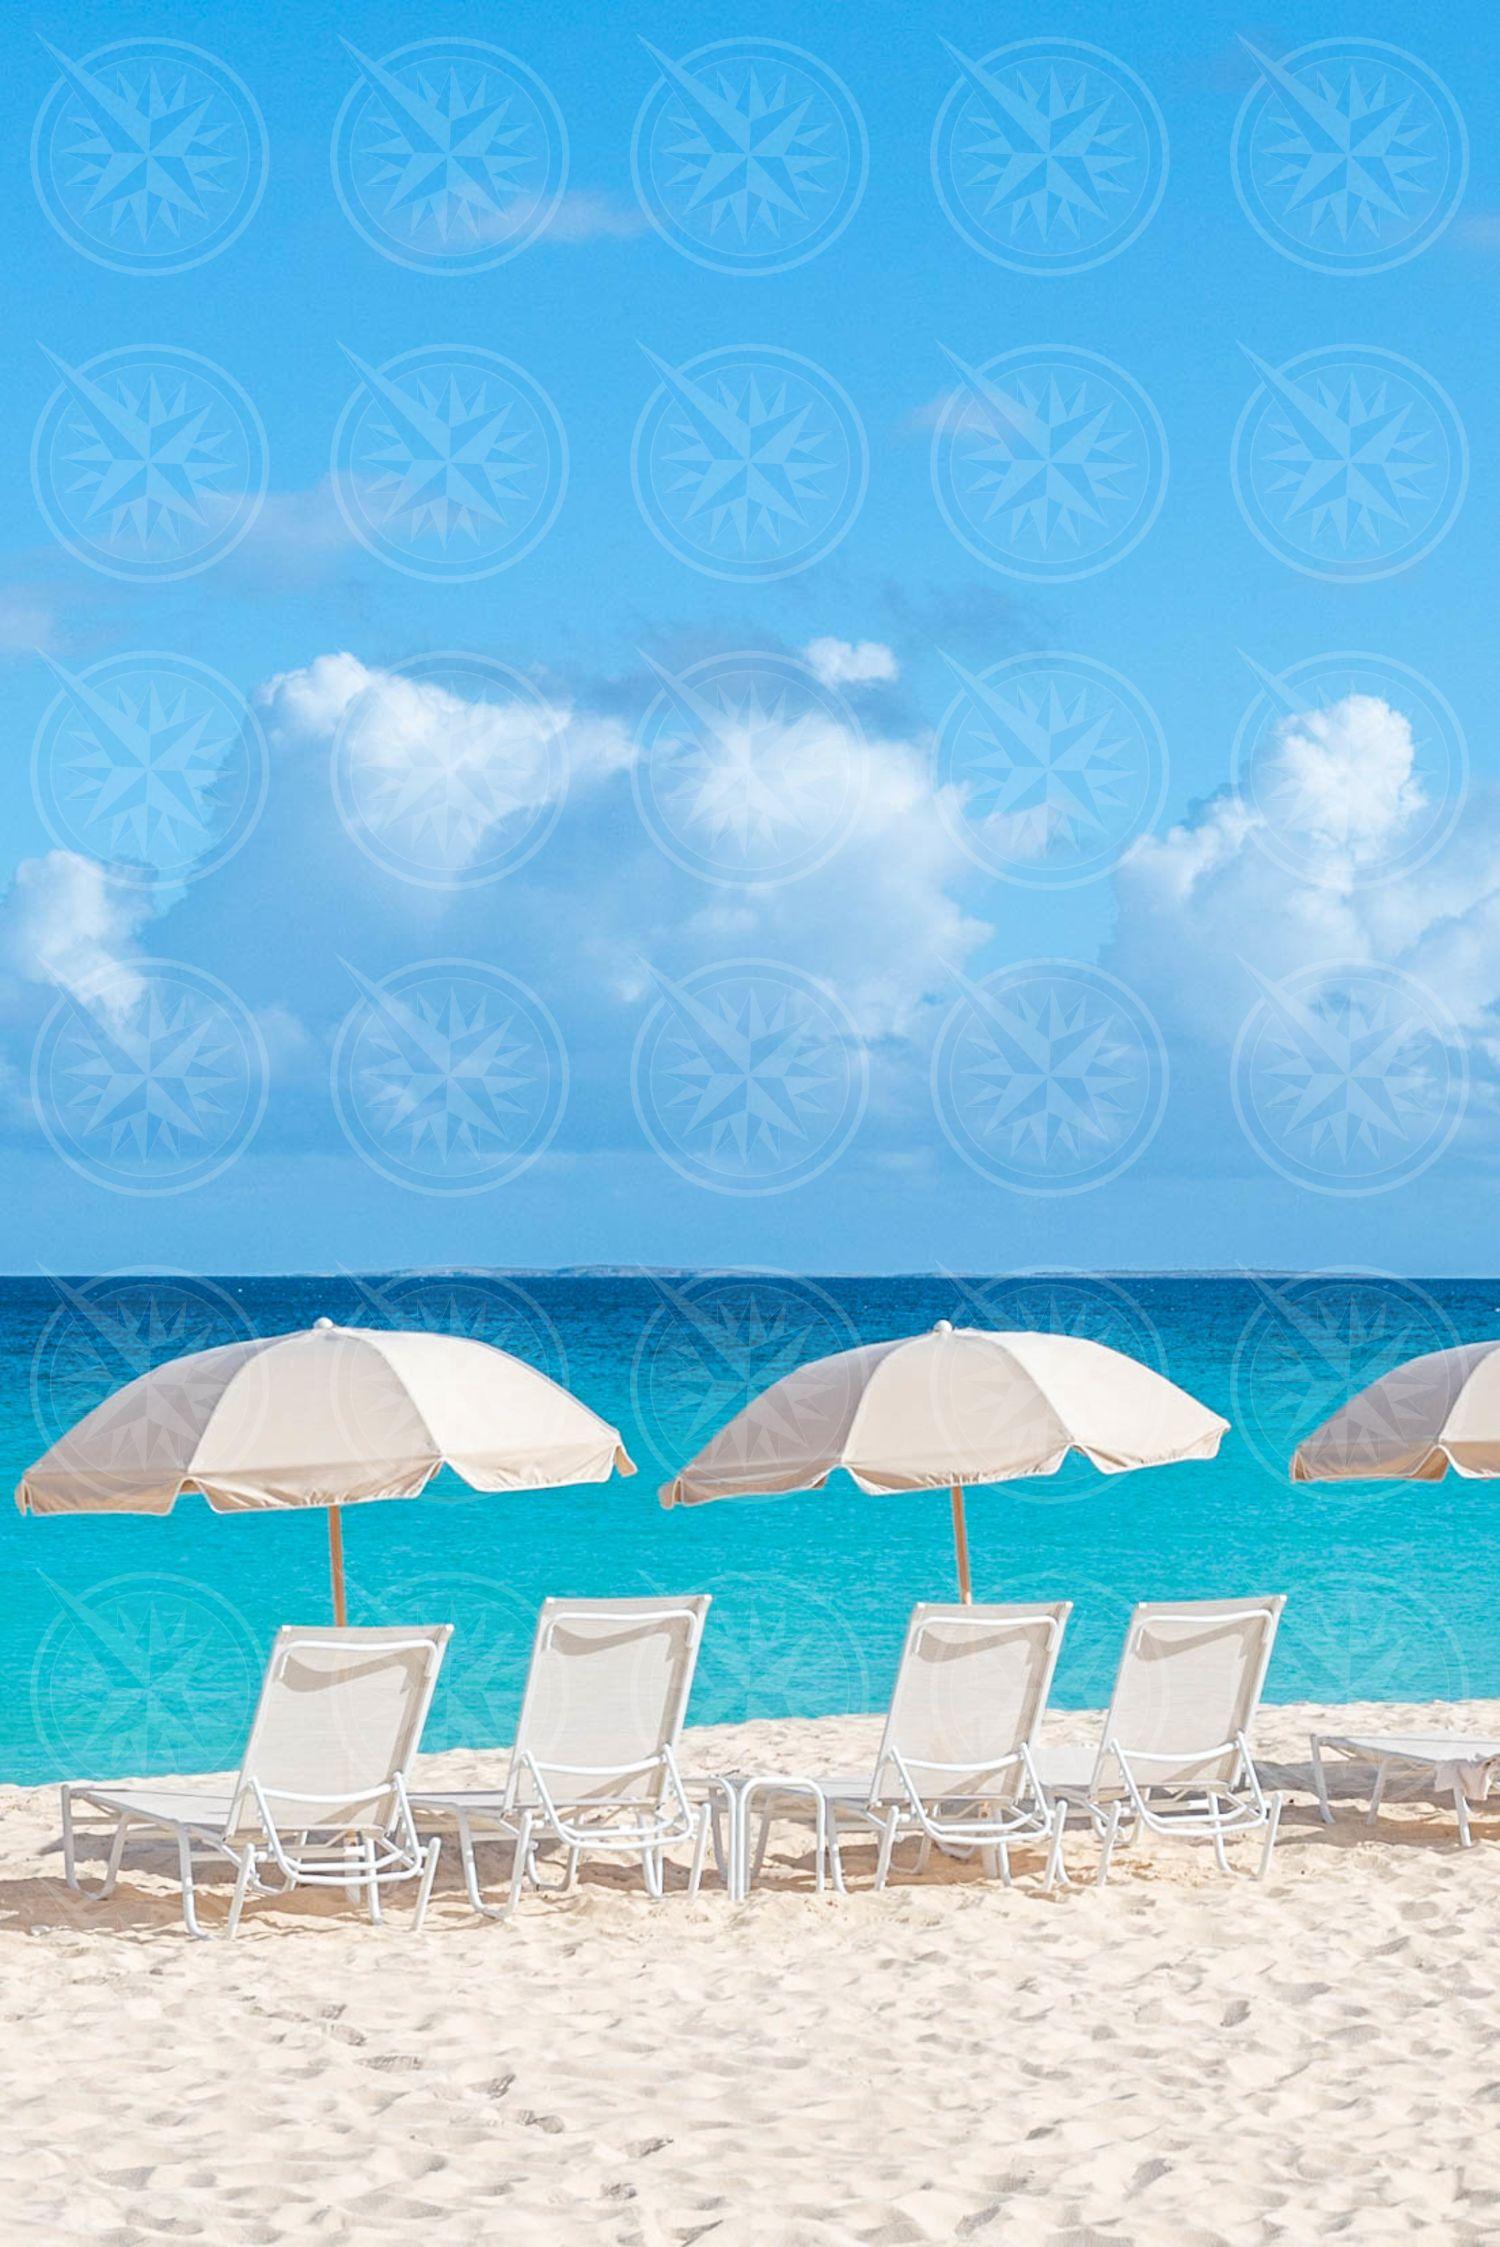 Line of umbrellas on white sand beach